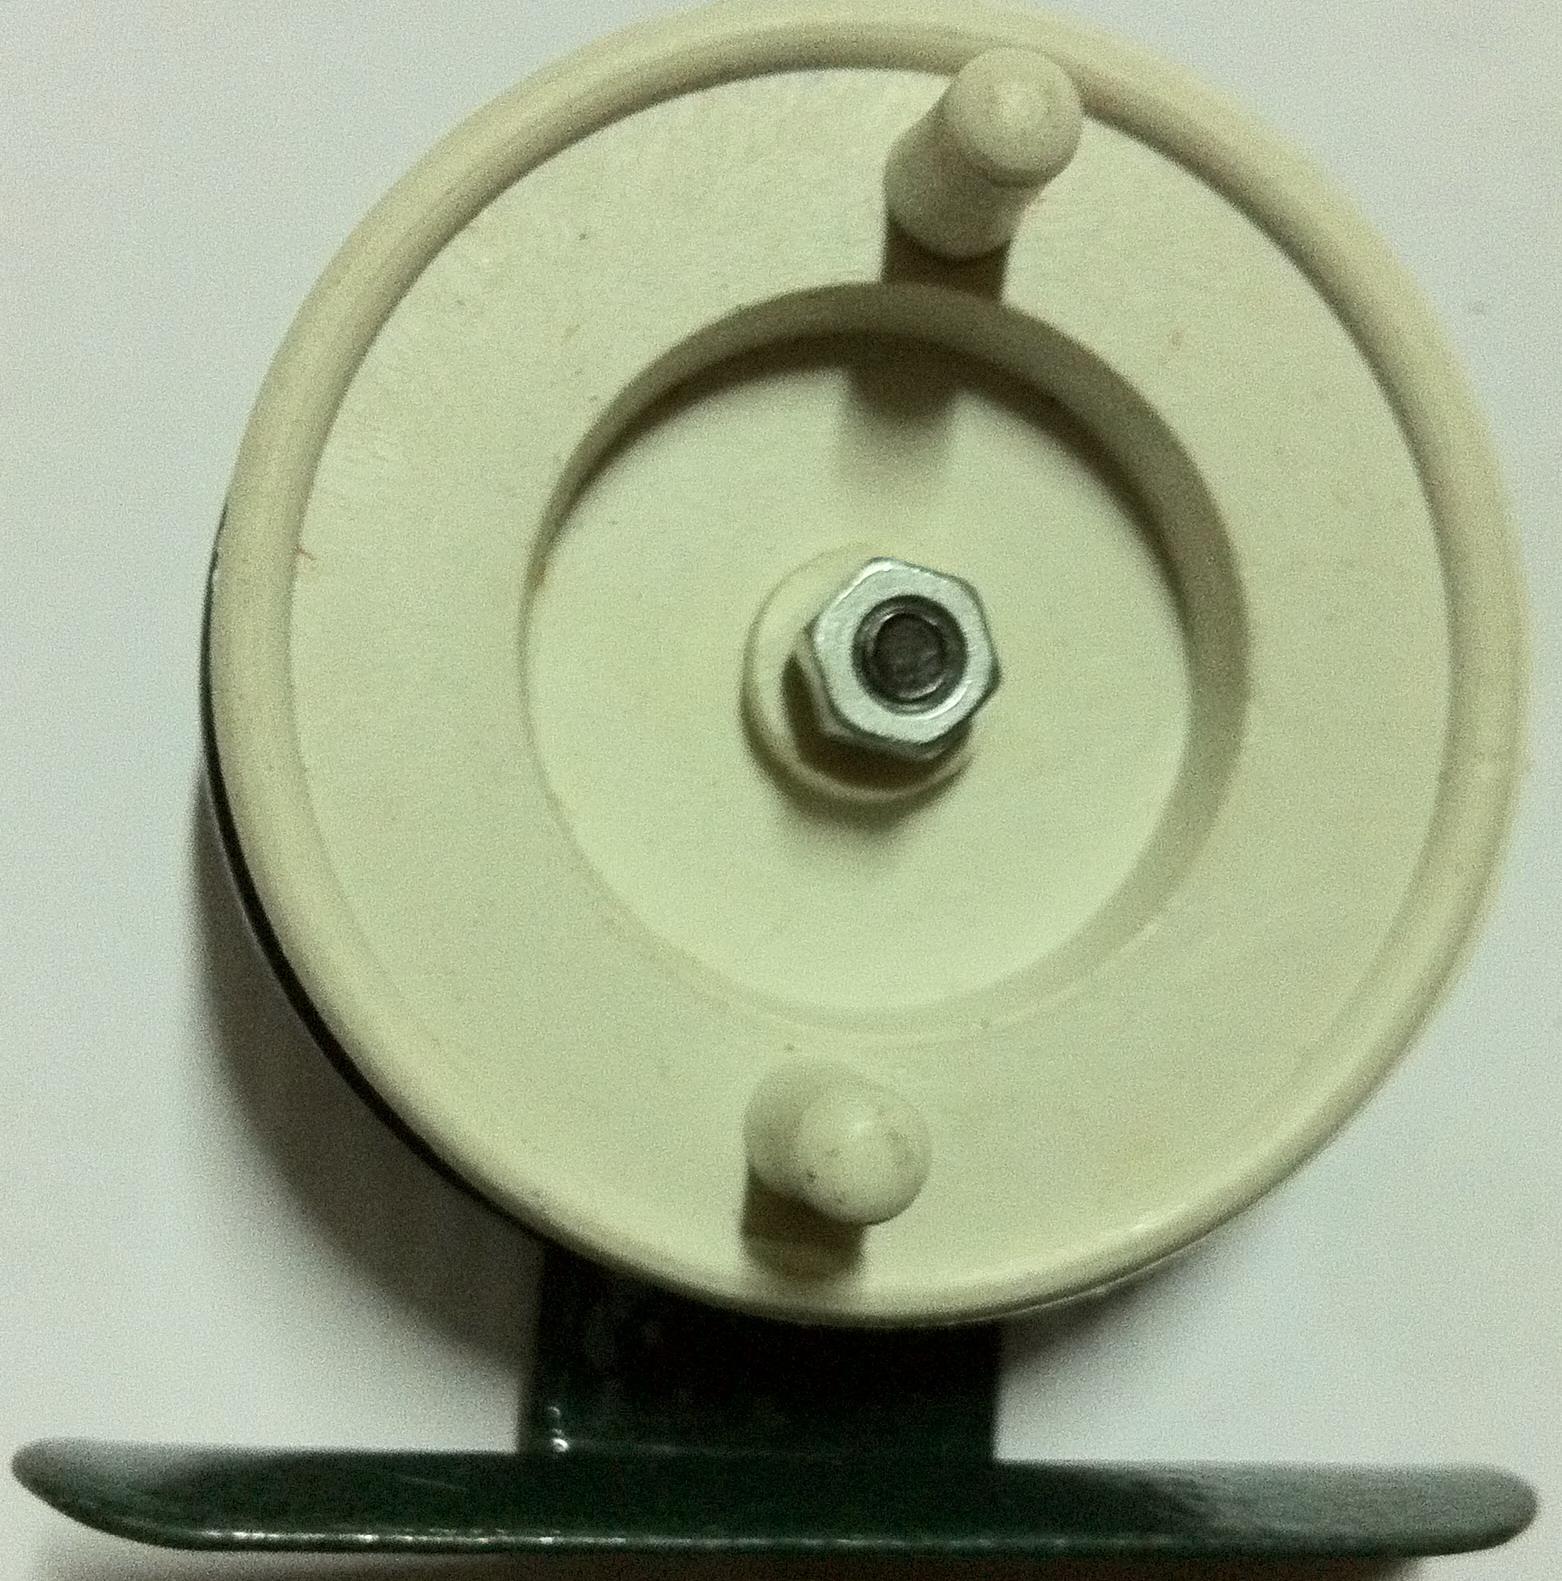 Катушка проводочная SWD №601Проводочные<br>Проводочная катушка SWD 601 имеет широкий <br>спектр применения. Диаметр барабана 55мм.<br>